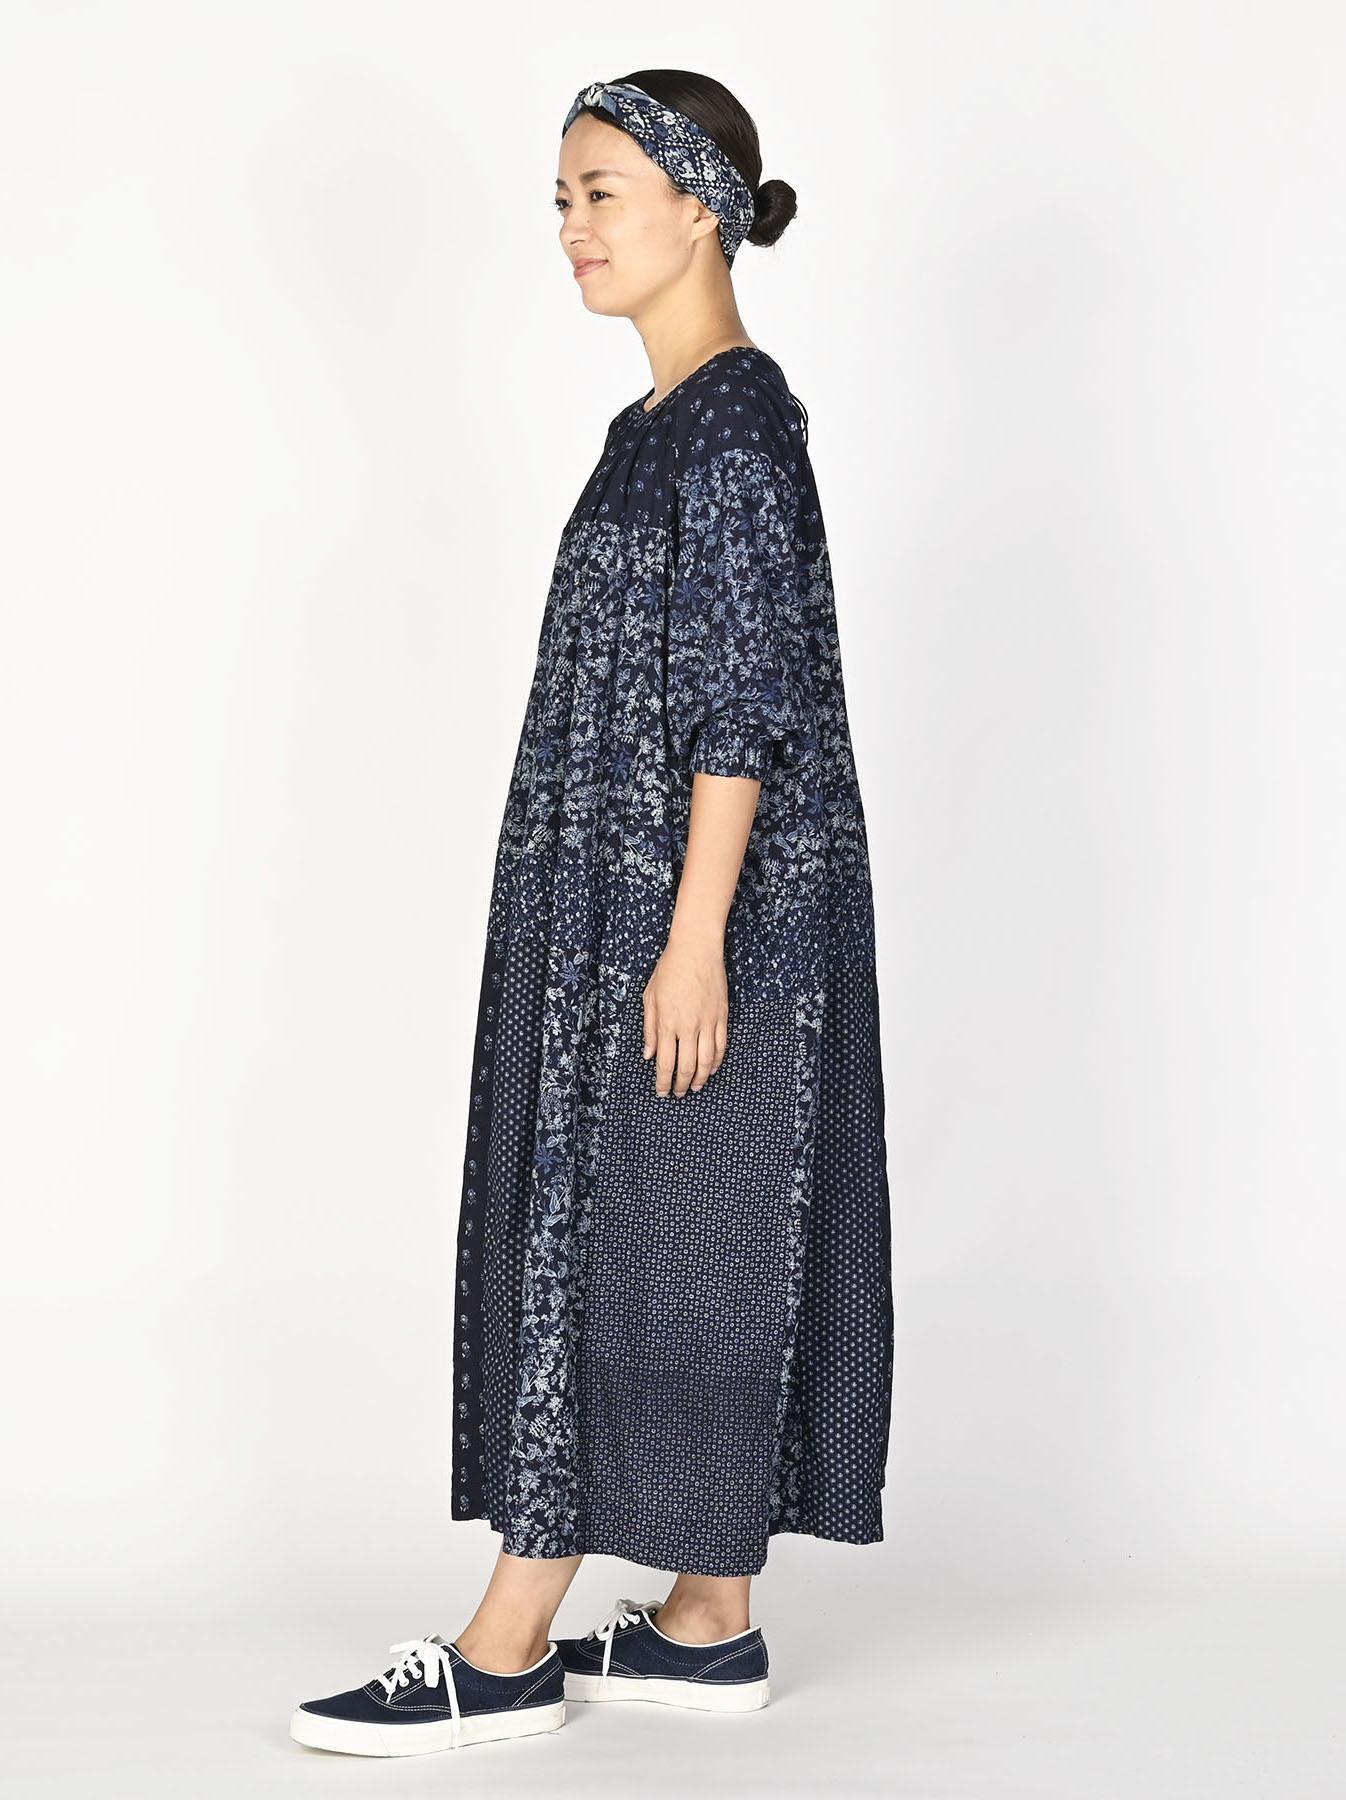 Indigo Tappet Flower Patchwork Dress-3